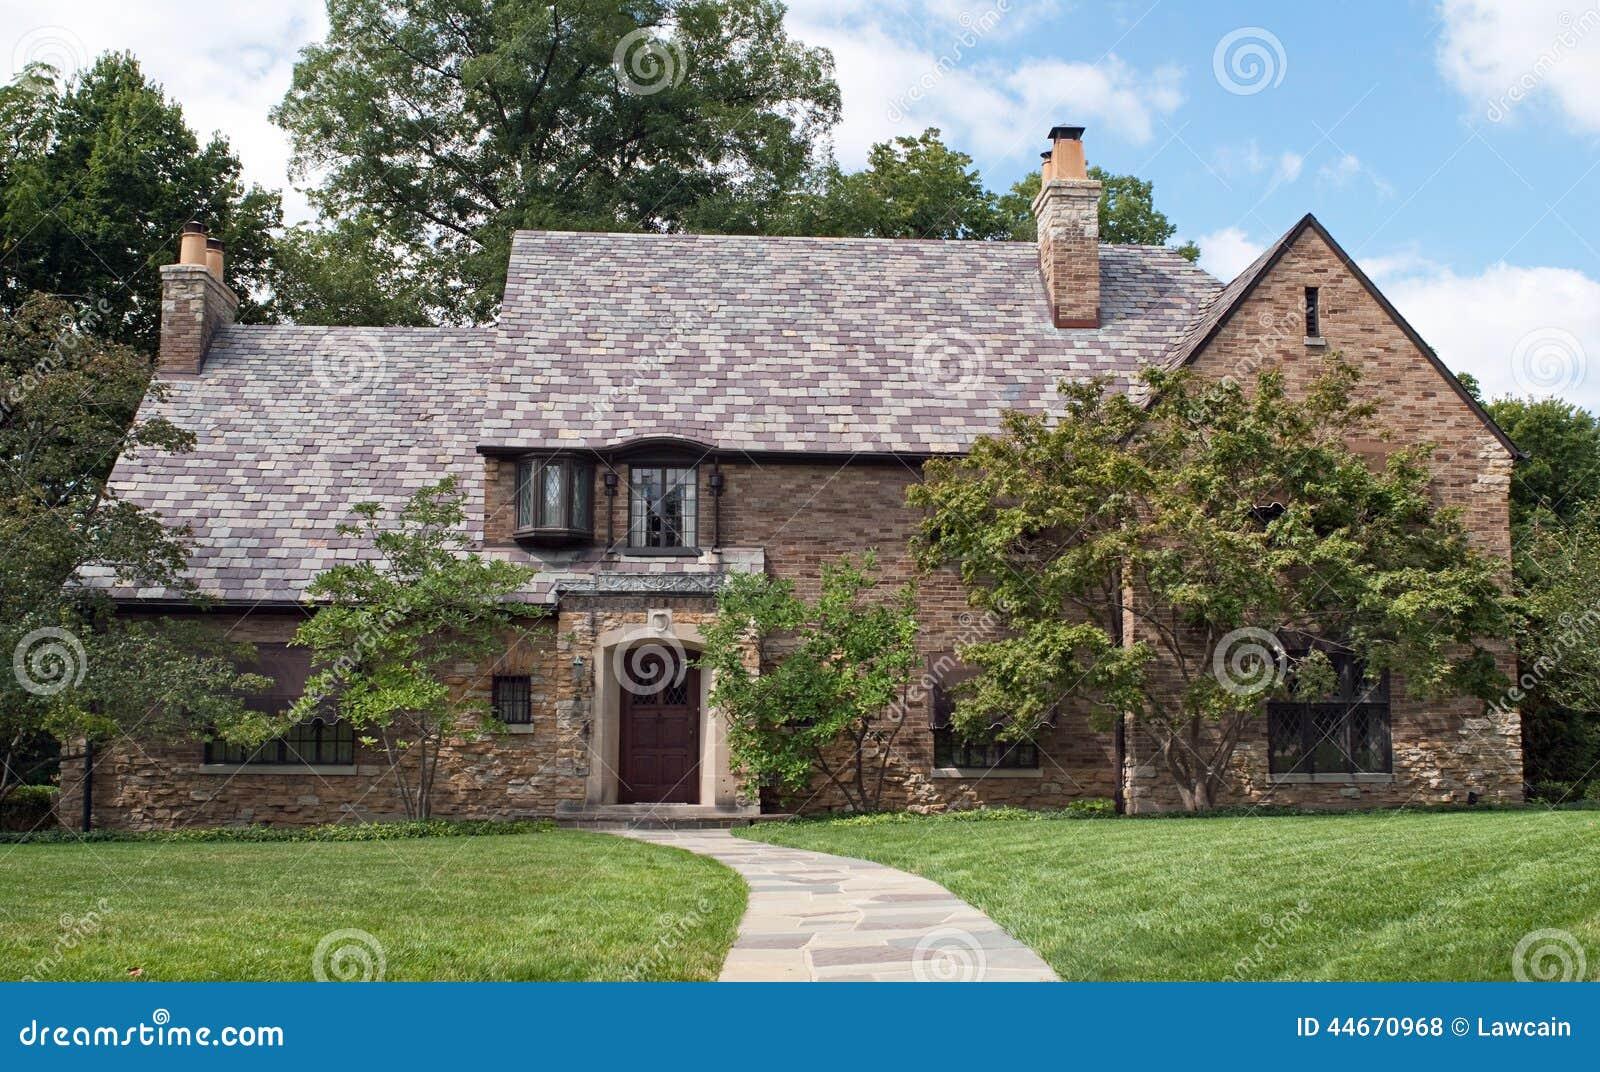 Tan Brick Amp Stone House Stock Photo Image Of Building